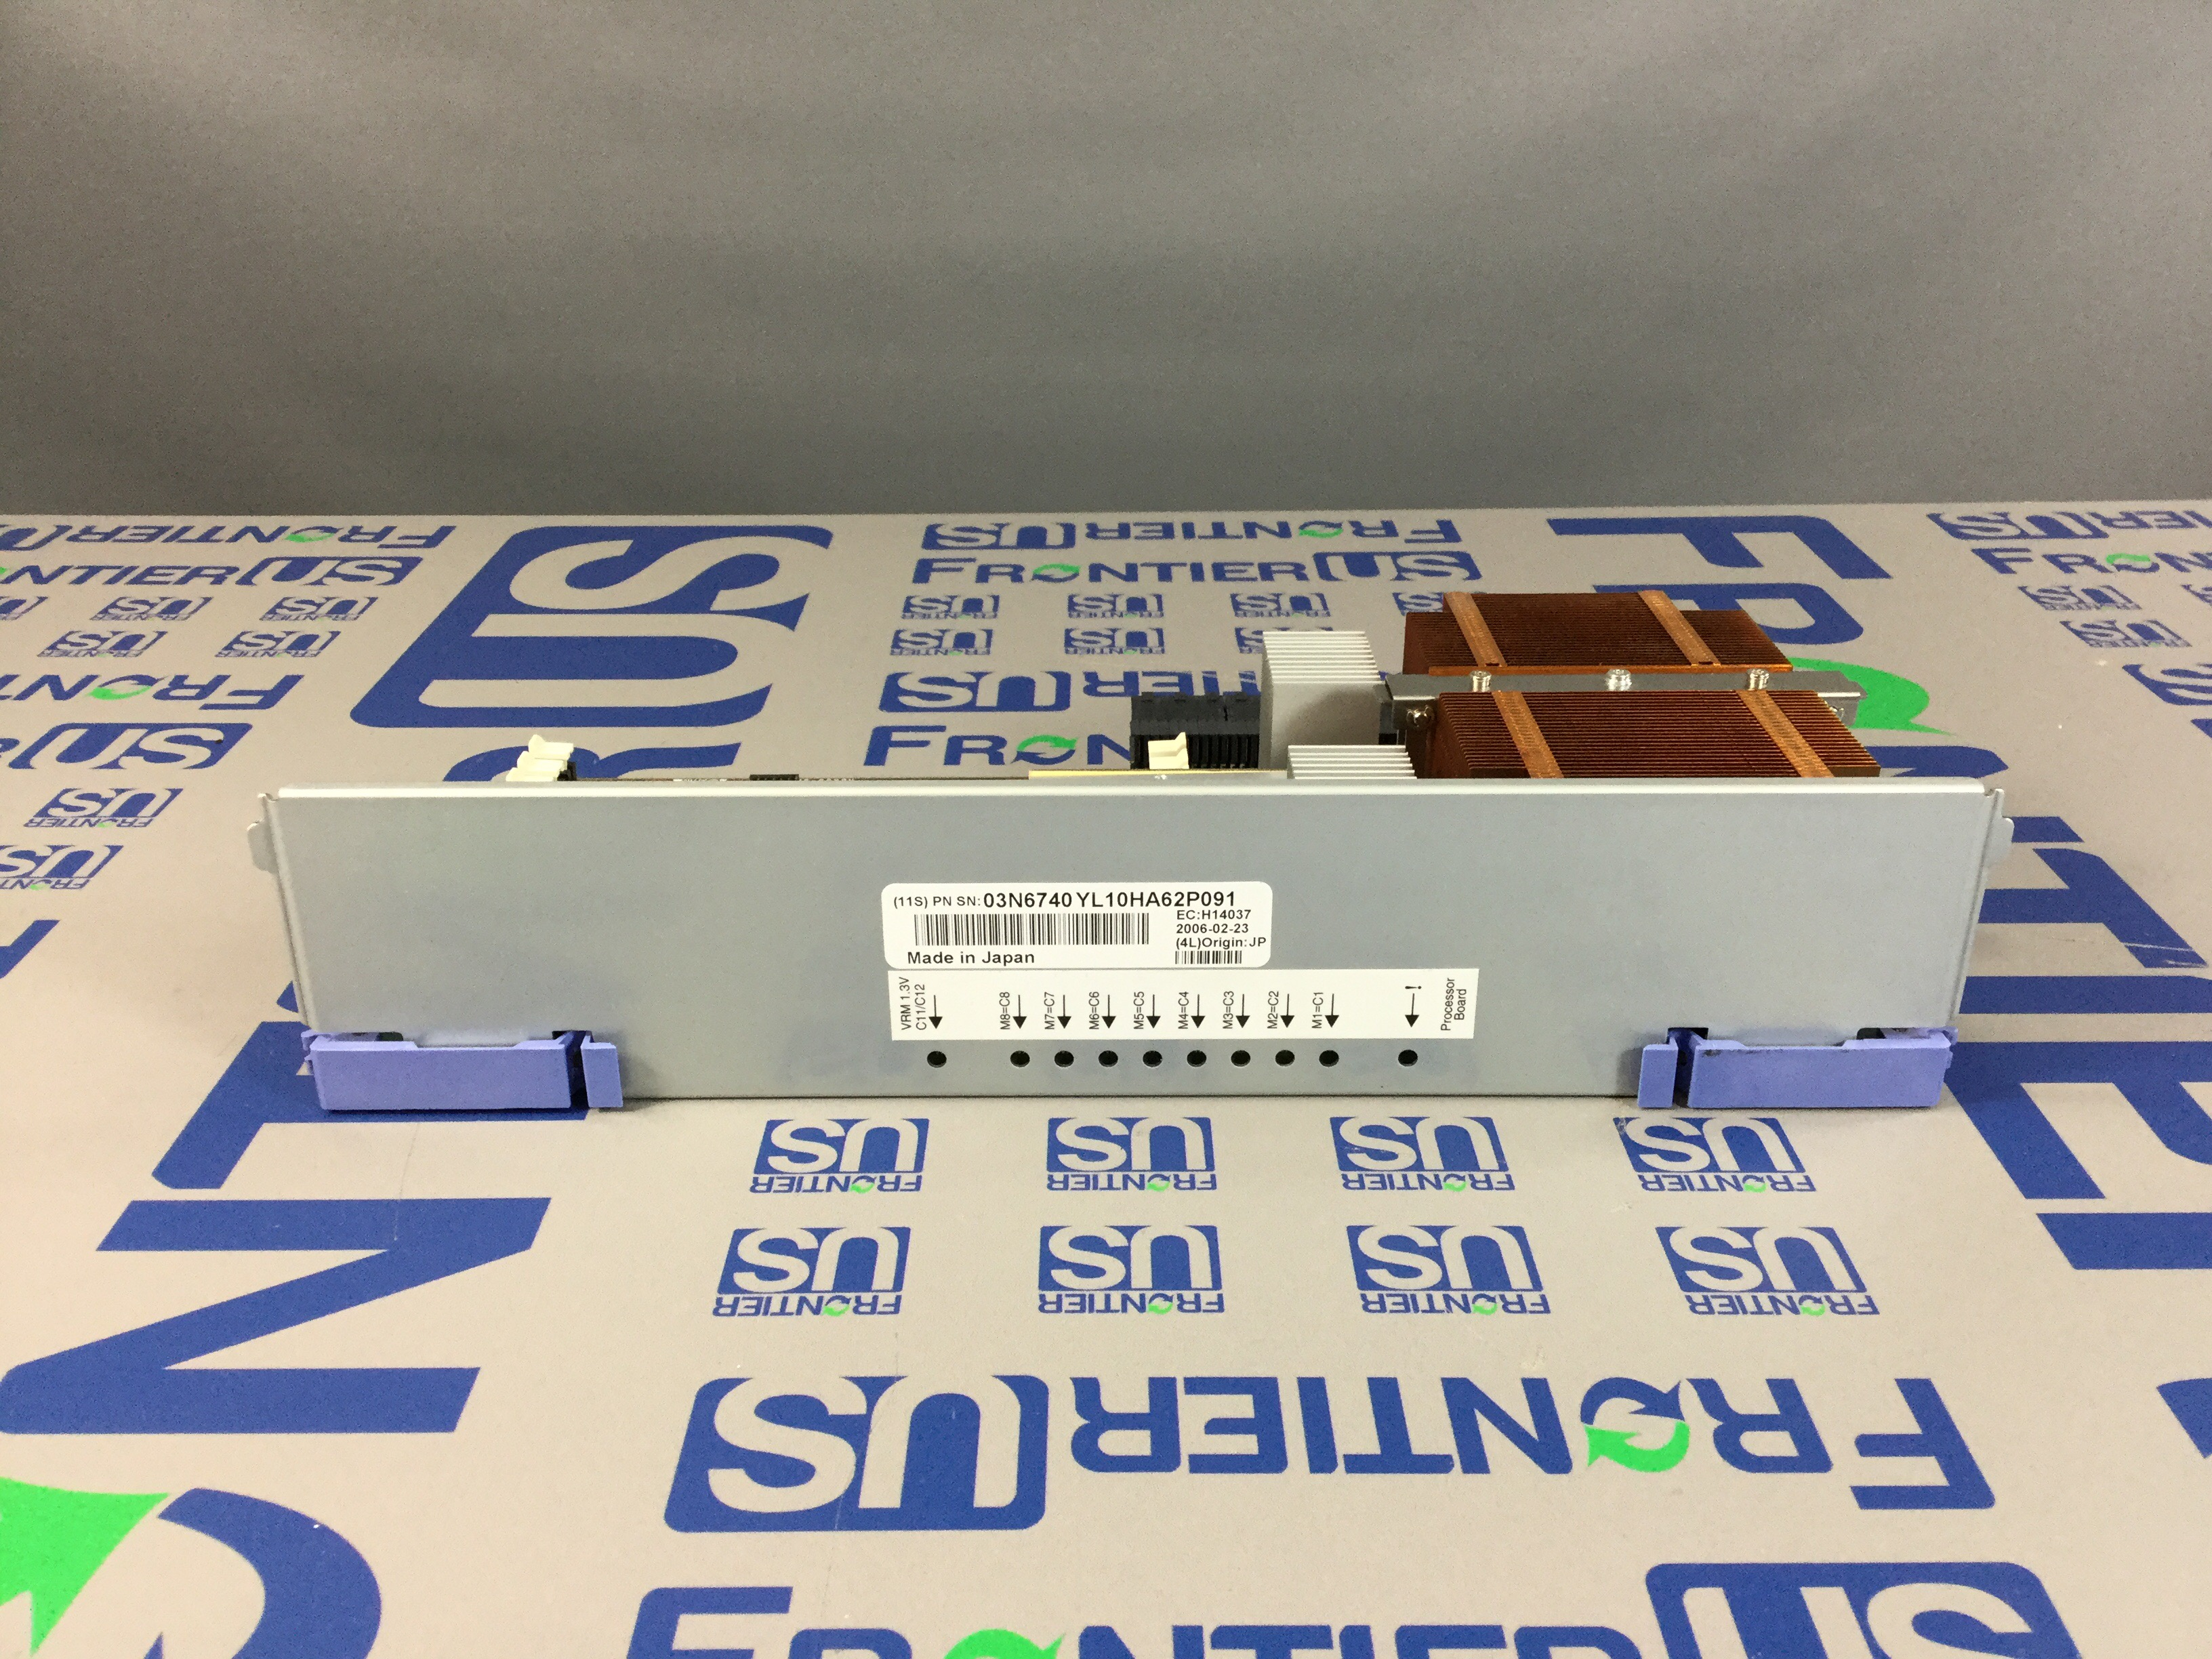 Processor 8313 IBM 03N6740 1.5GHZ 4WAY POWER5